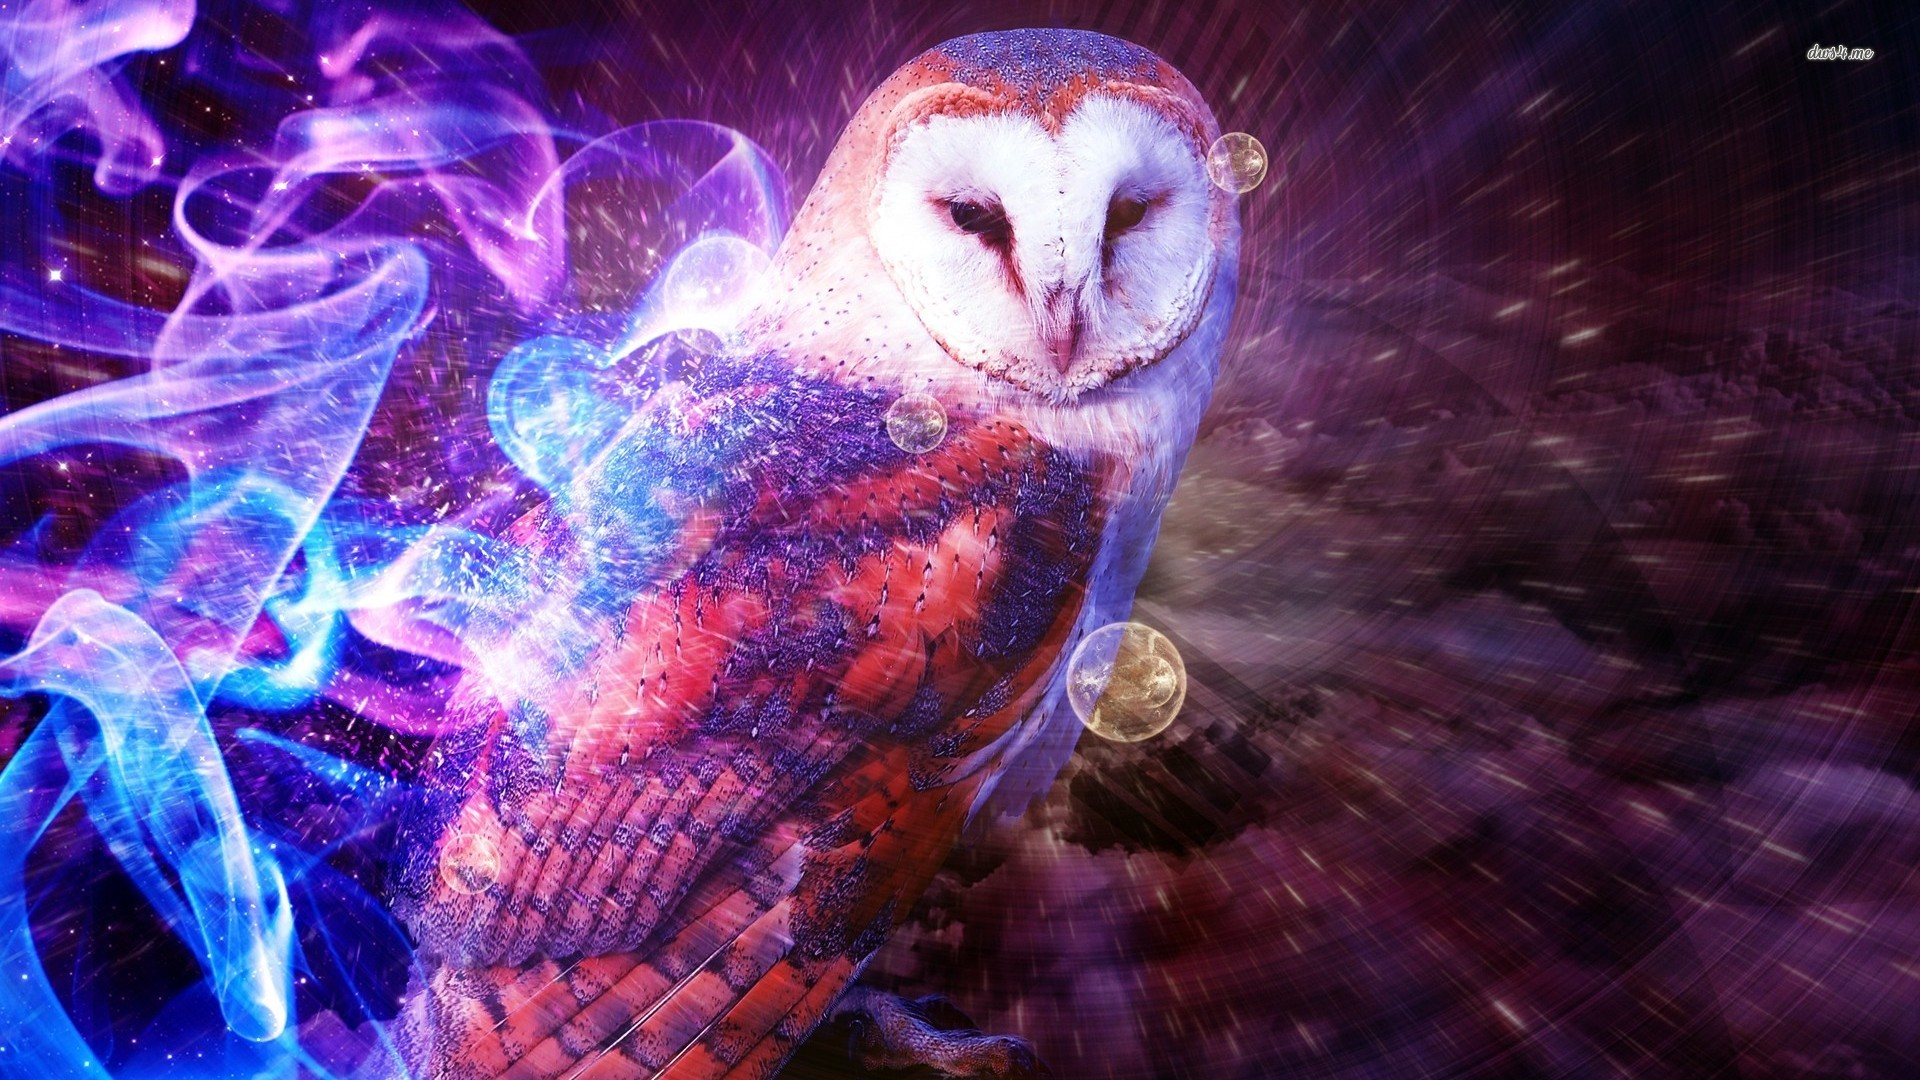 Owl wallpaper – Digital Art wallpapers – #8713